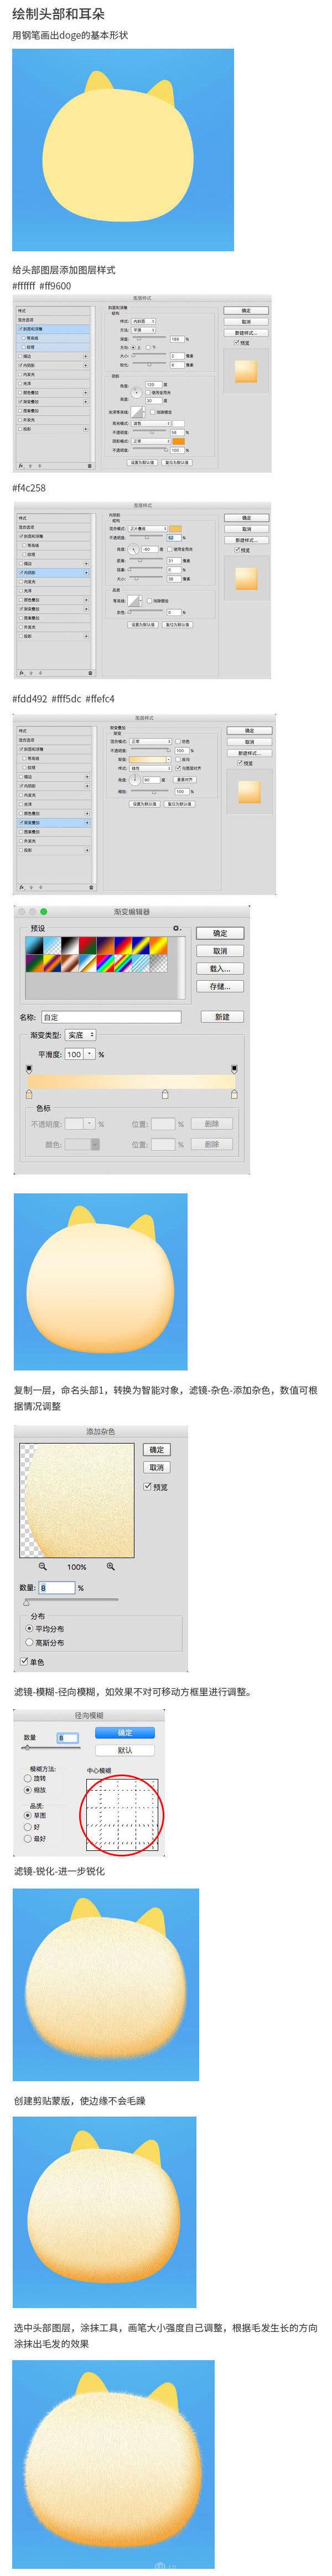 Photoshop繪制可愛的卡通小狗頭像教程,PS教程,思緣教程網